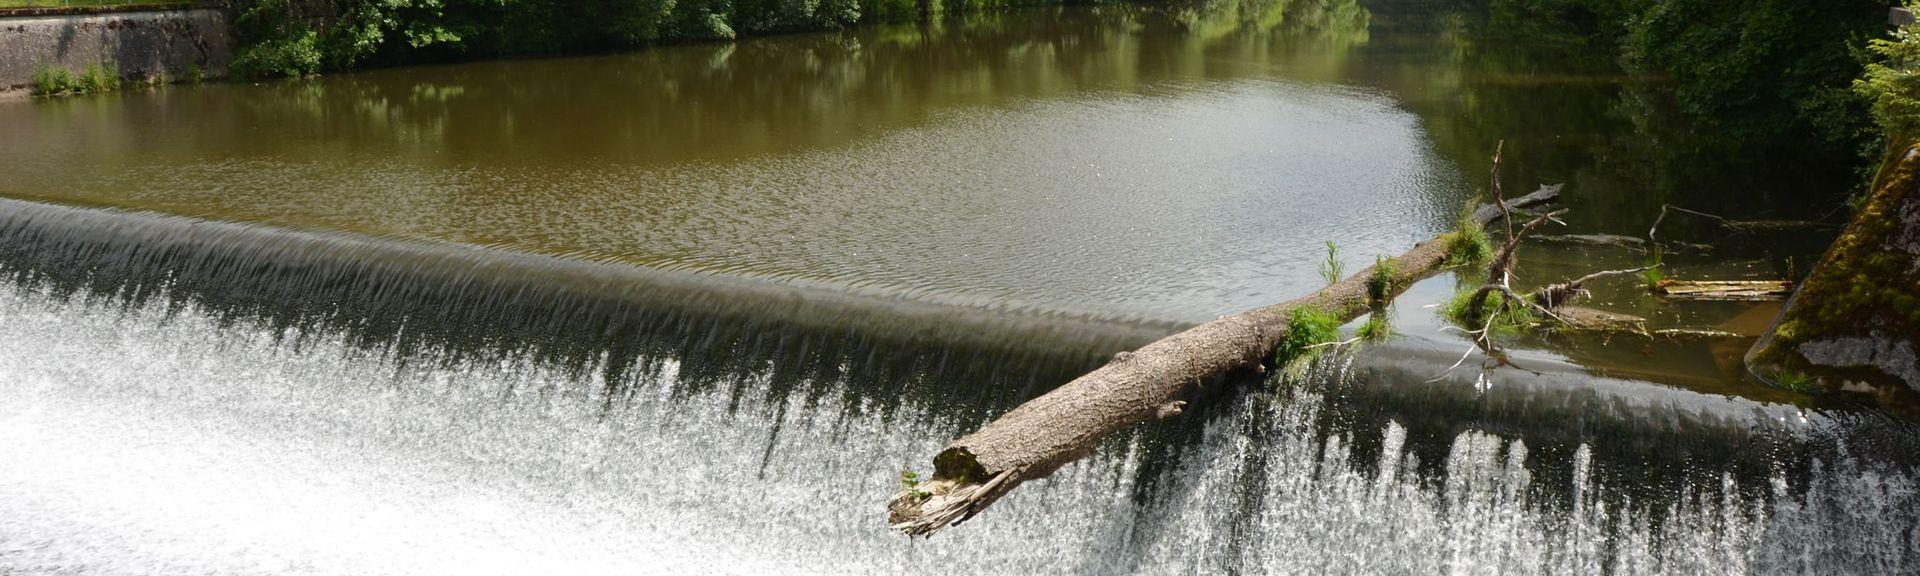 Jilemnice, Kraj liberecki, Czechy